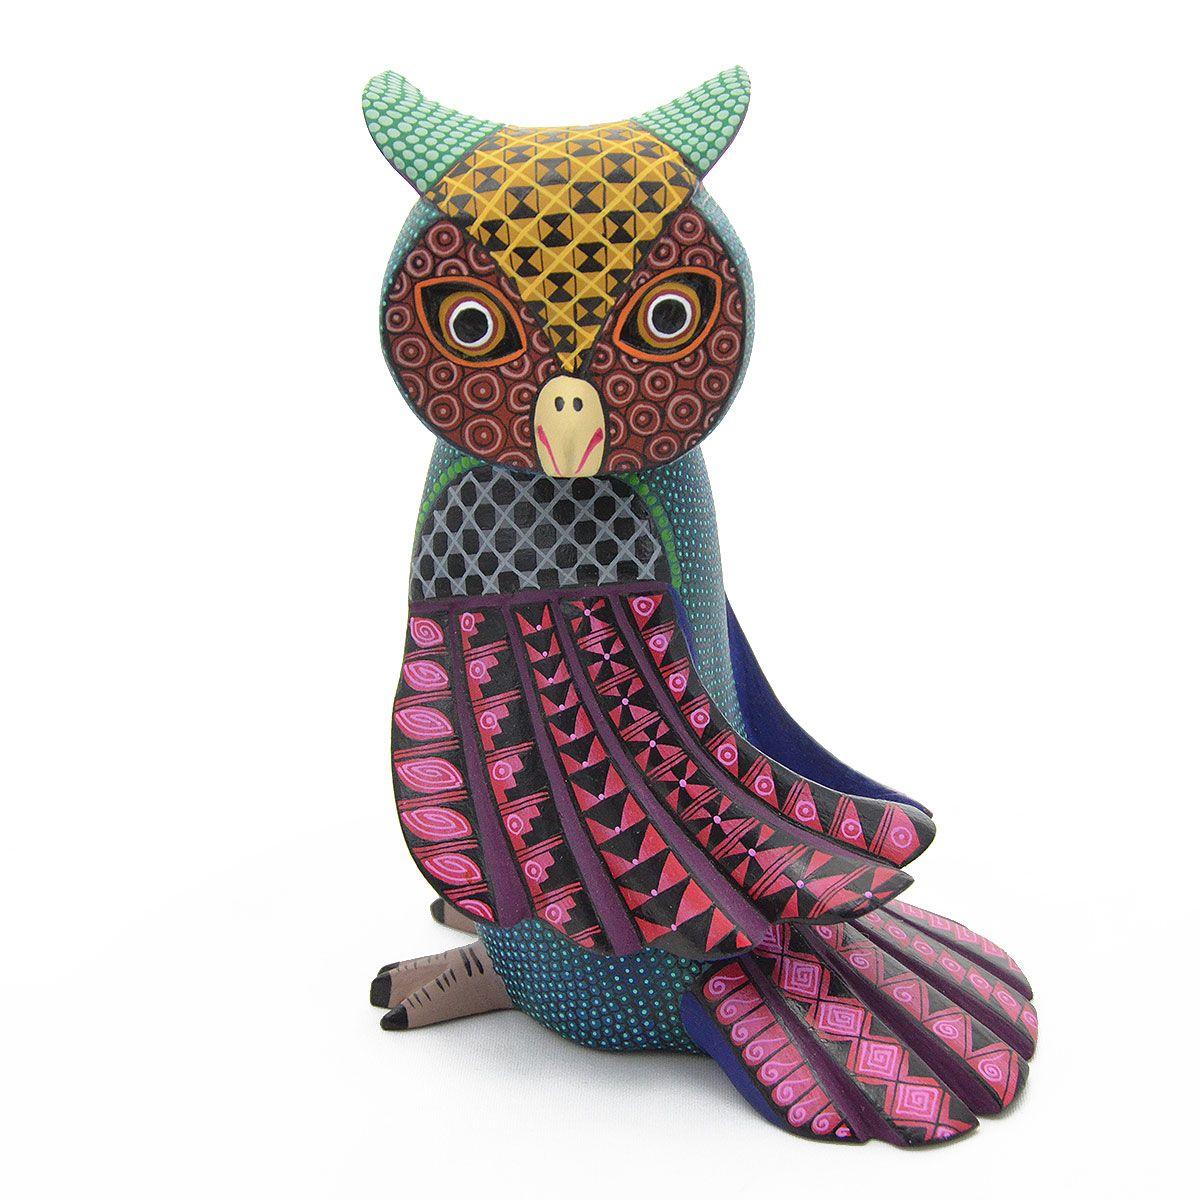 Eduardo Fabian & Daniela Hernandez: Medium Owl